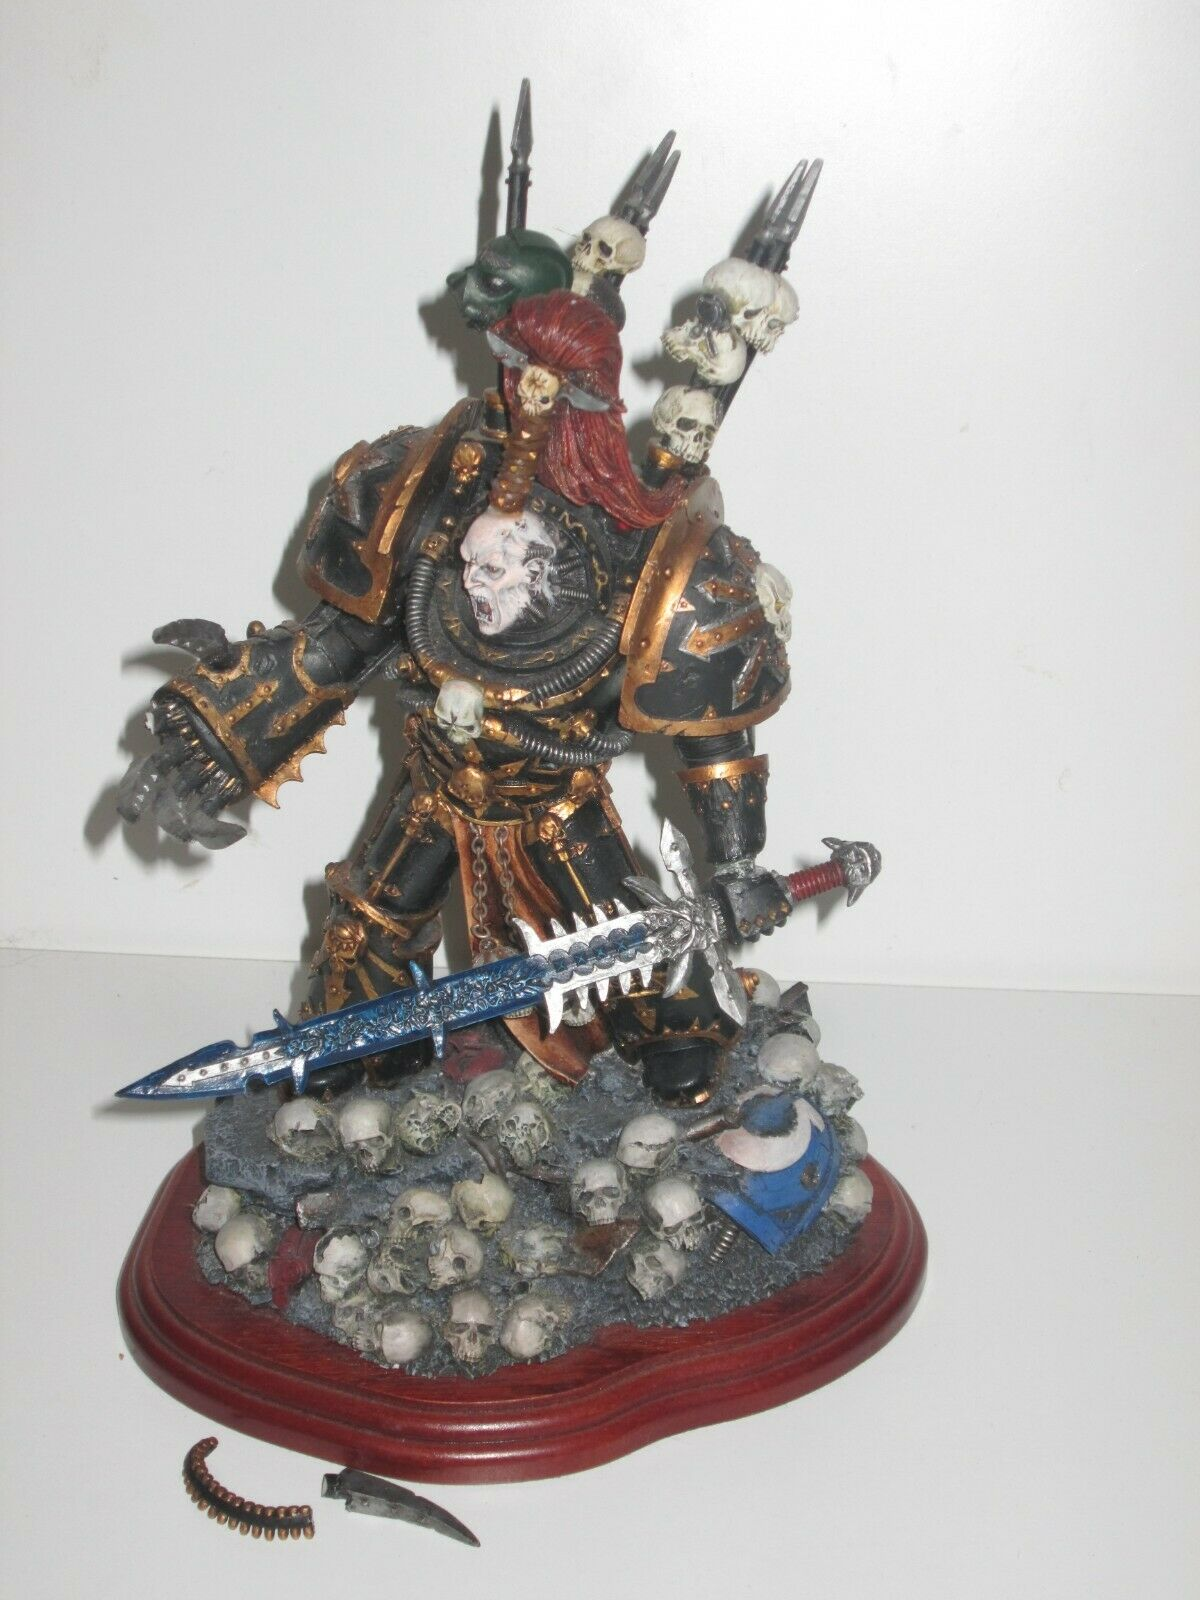 Forgeworld Warhammer 40K Chaos Space Marine Abaddon Statue on Wooden Plinth